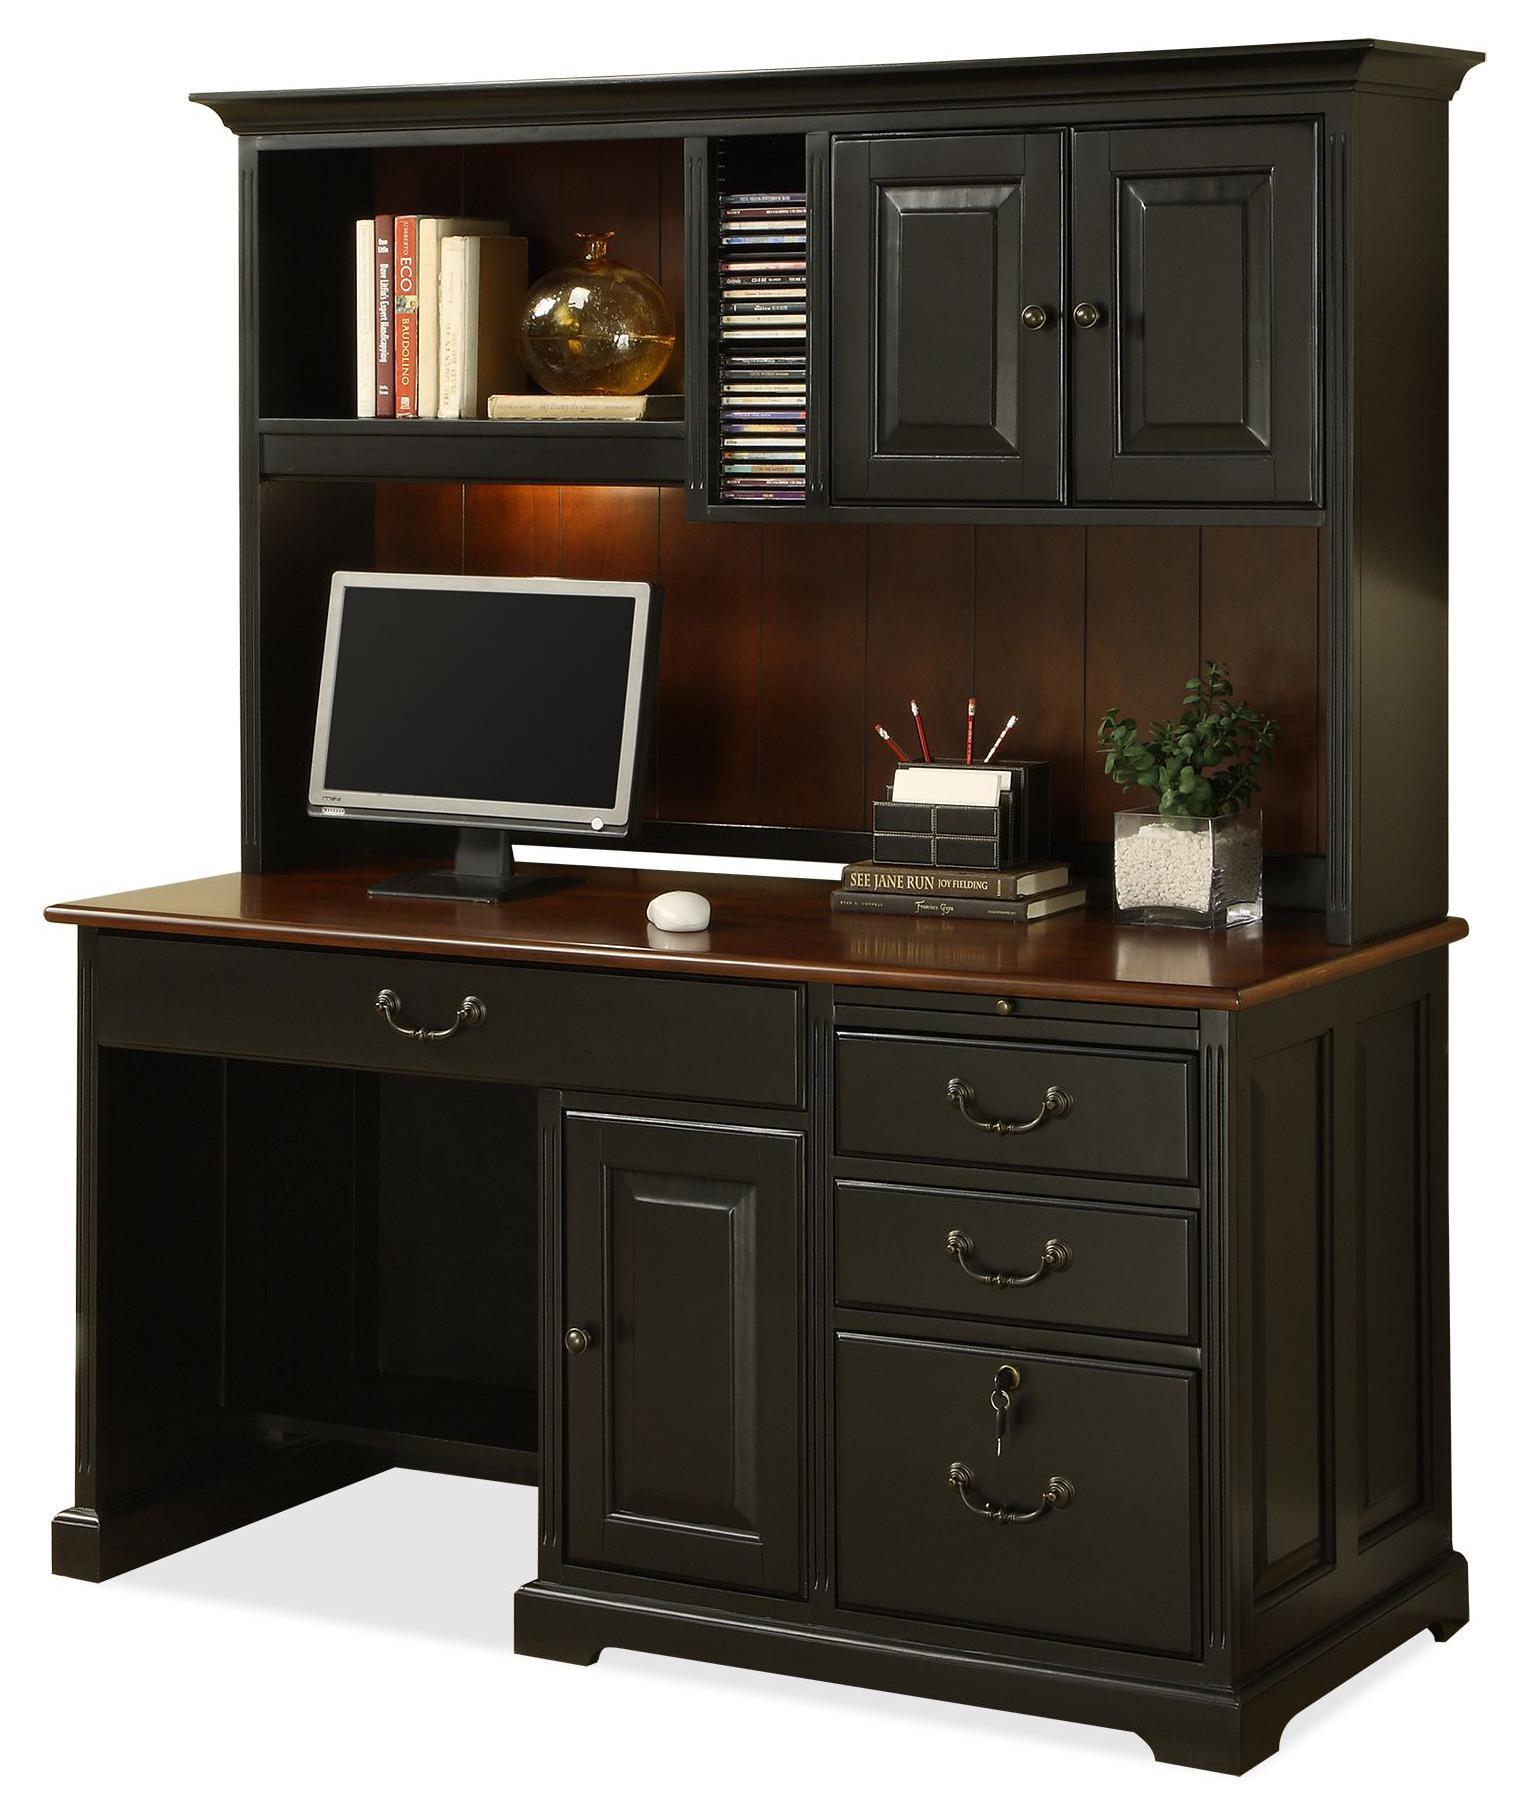 Single Pedestal puter Desk with Storage Hutch by